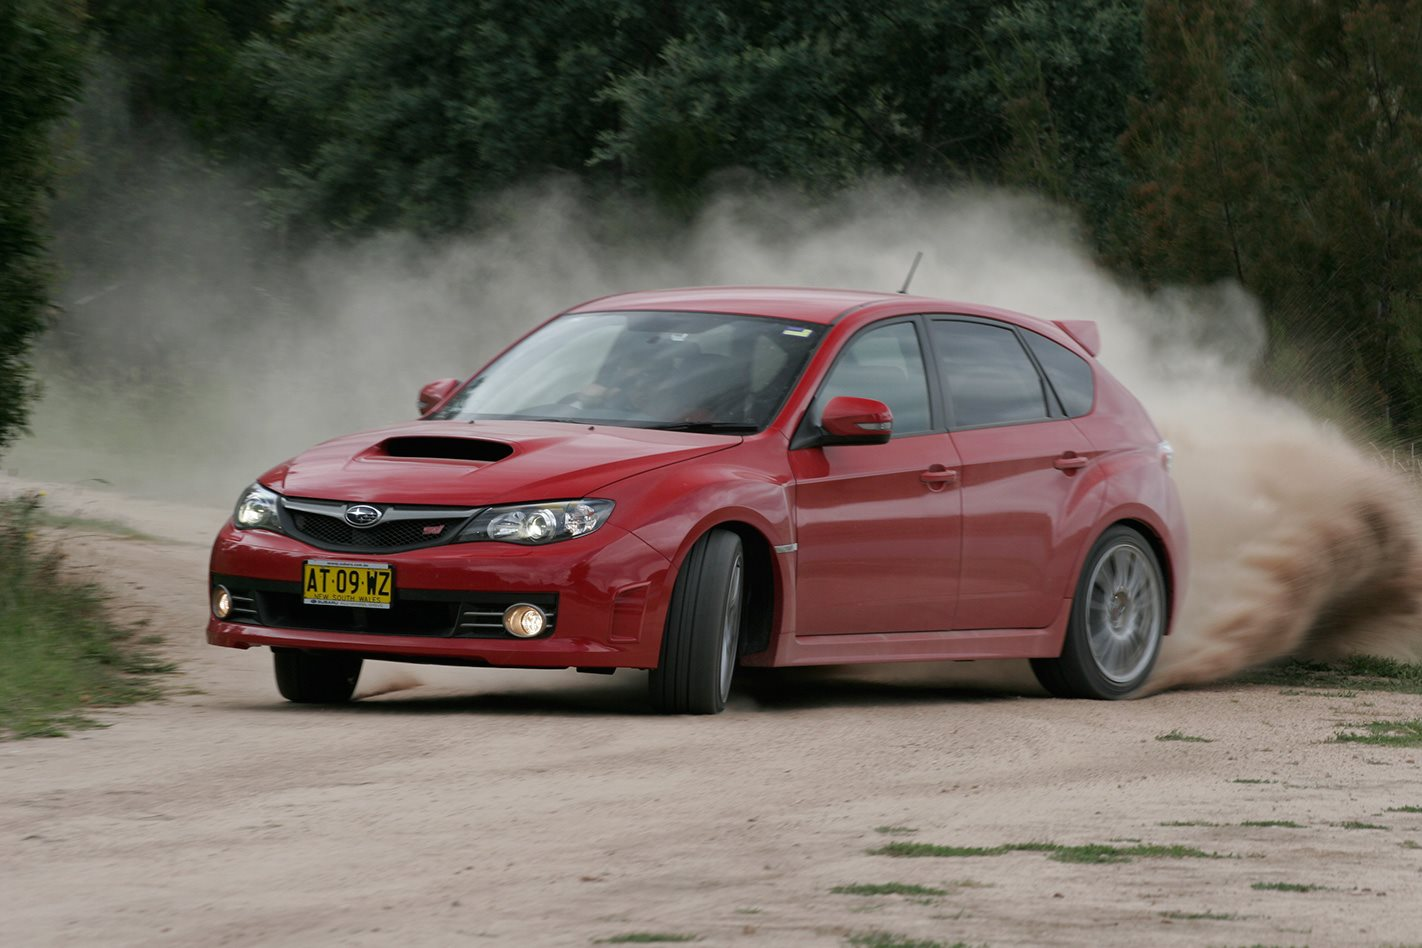 2008 Subaru Impreza WRX STI drifting.jpg